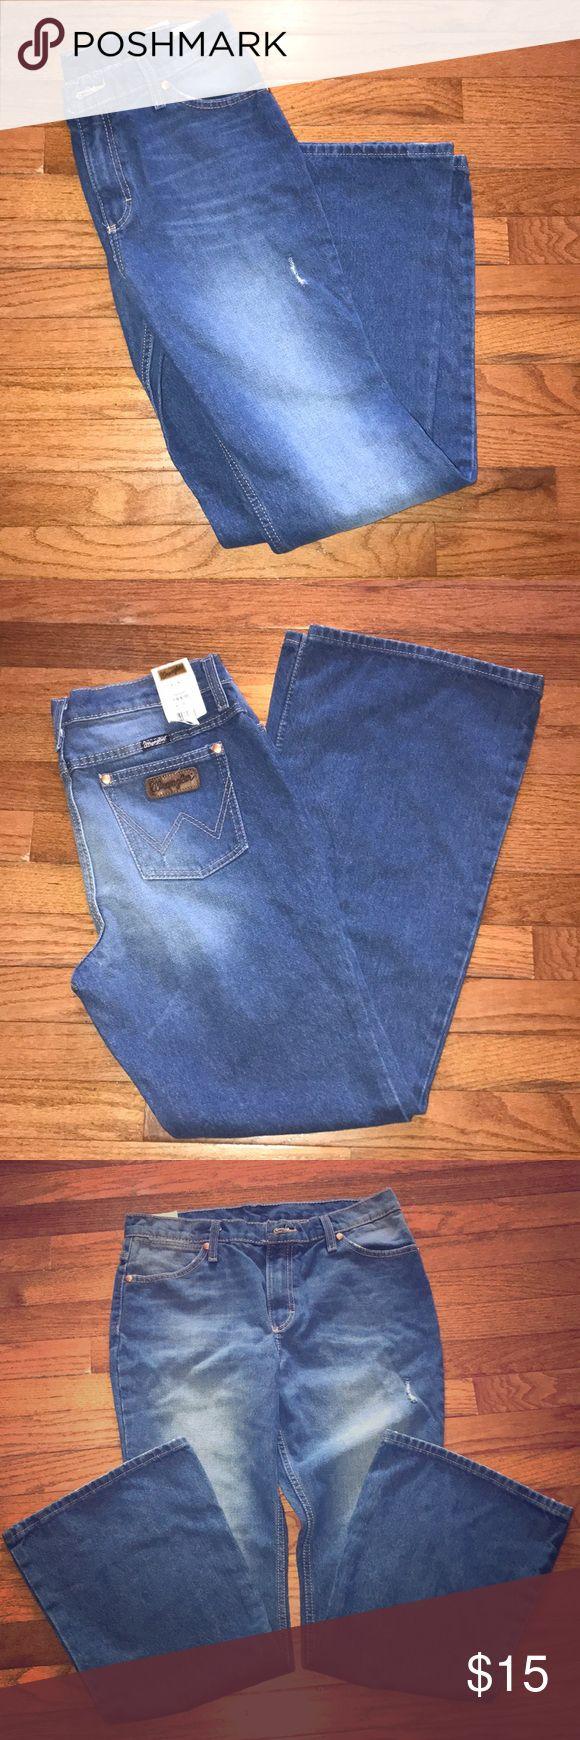 Cute Bootcut Blue Women's Jeans Wrangler 7/8 - 30 Brand new! Very cute! Wrangler Jeans Boot Cut